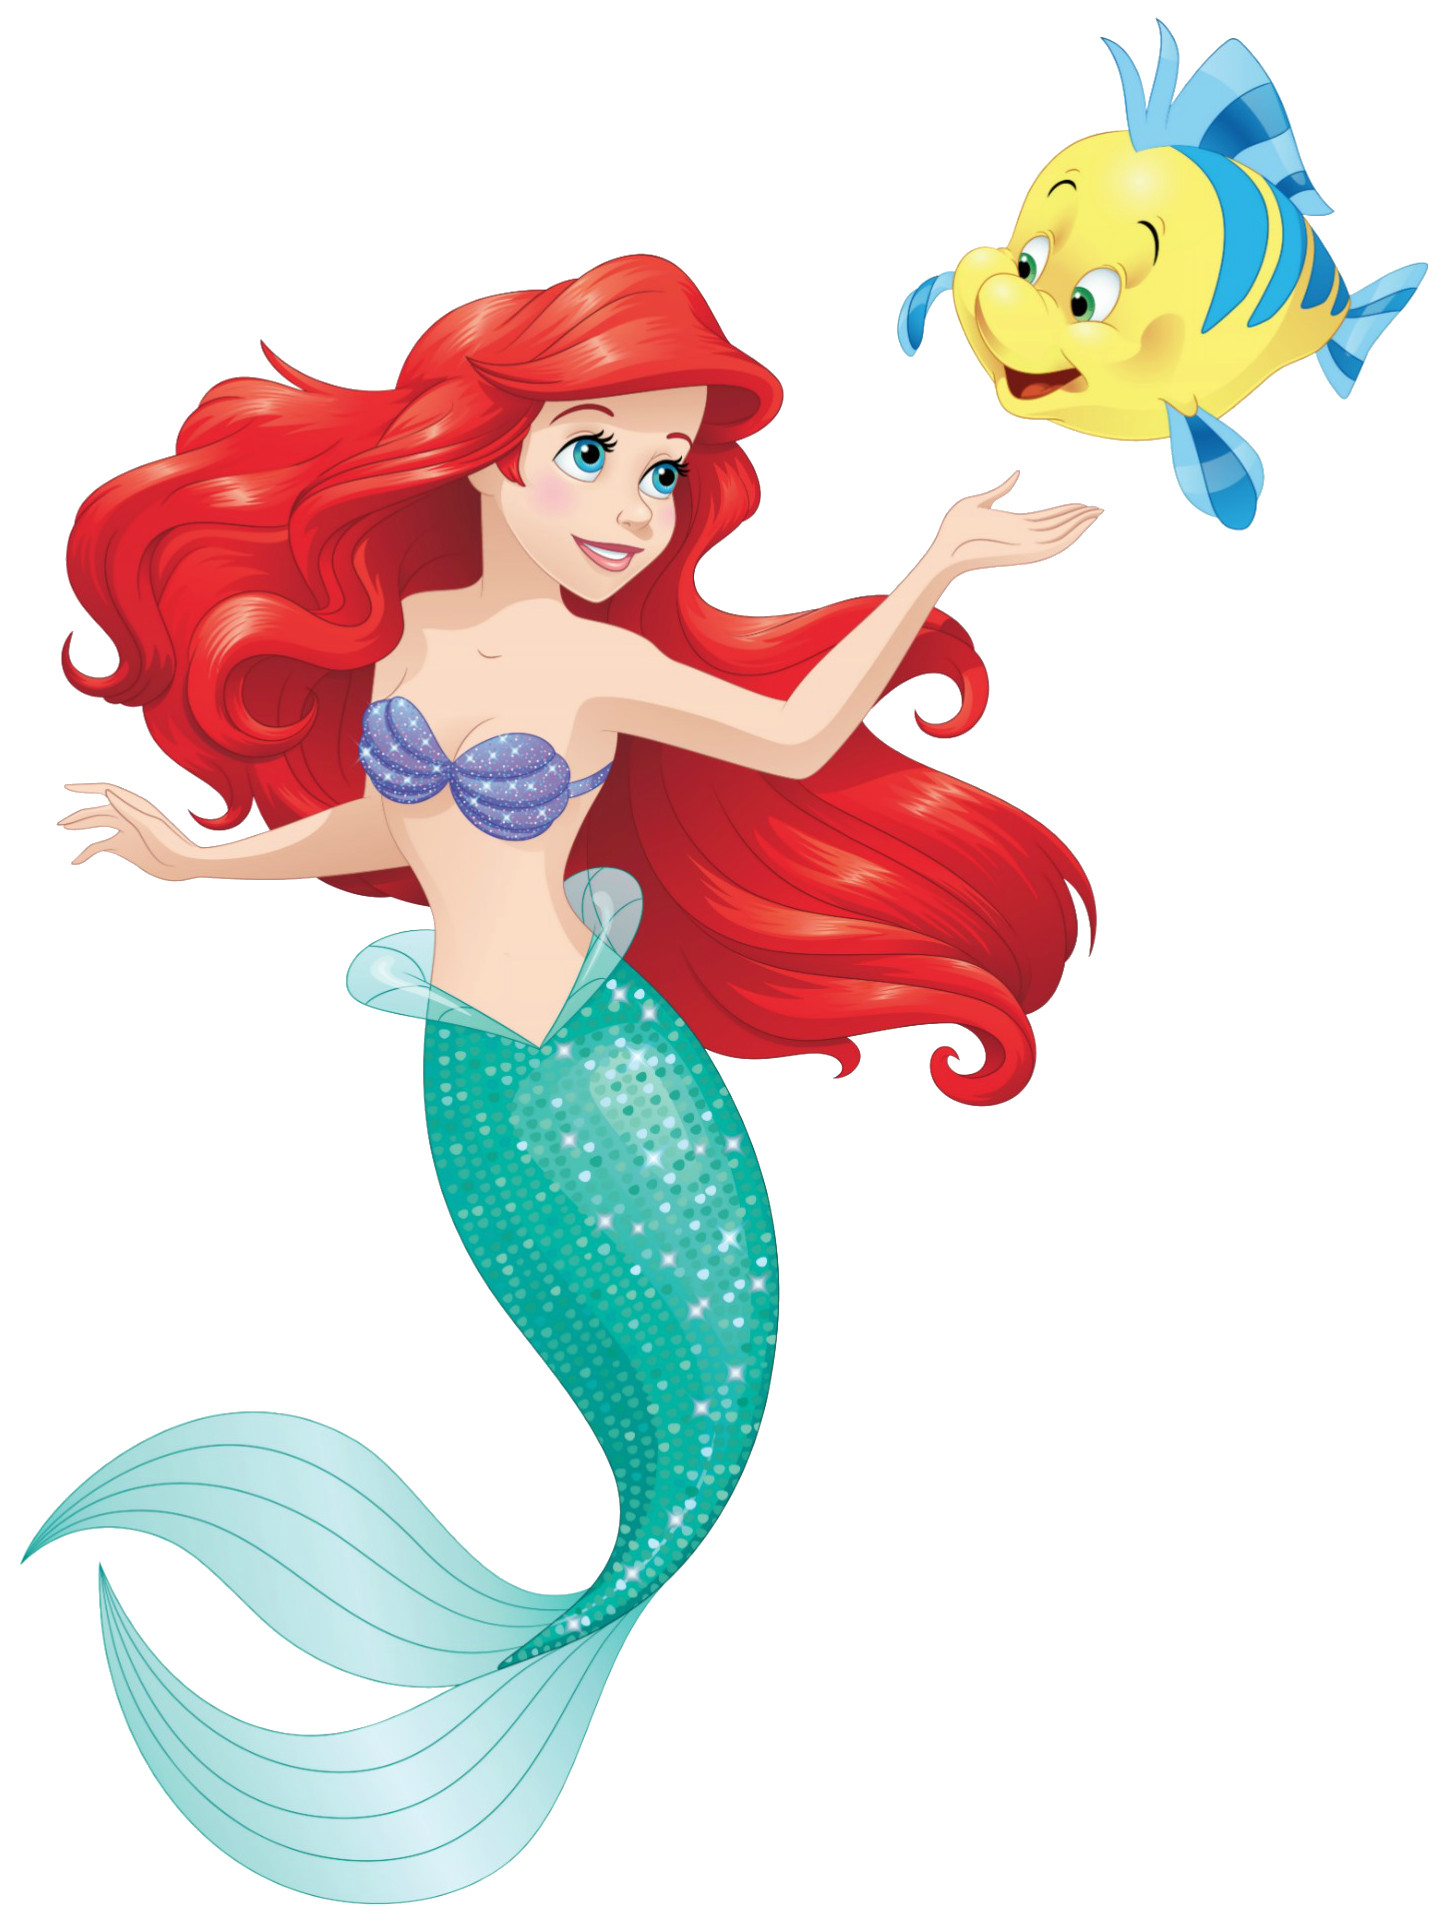 Disney jkfloodrelief org. Ariel clipart